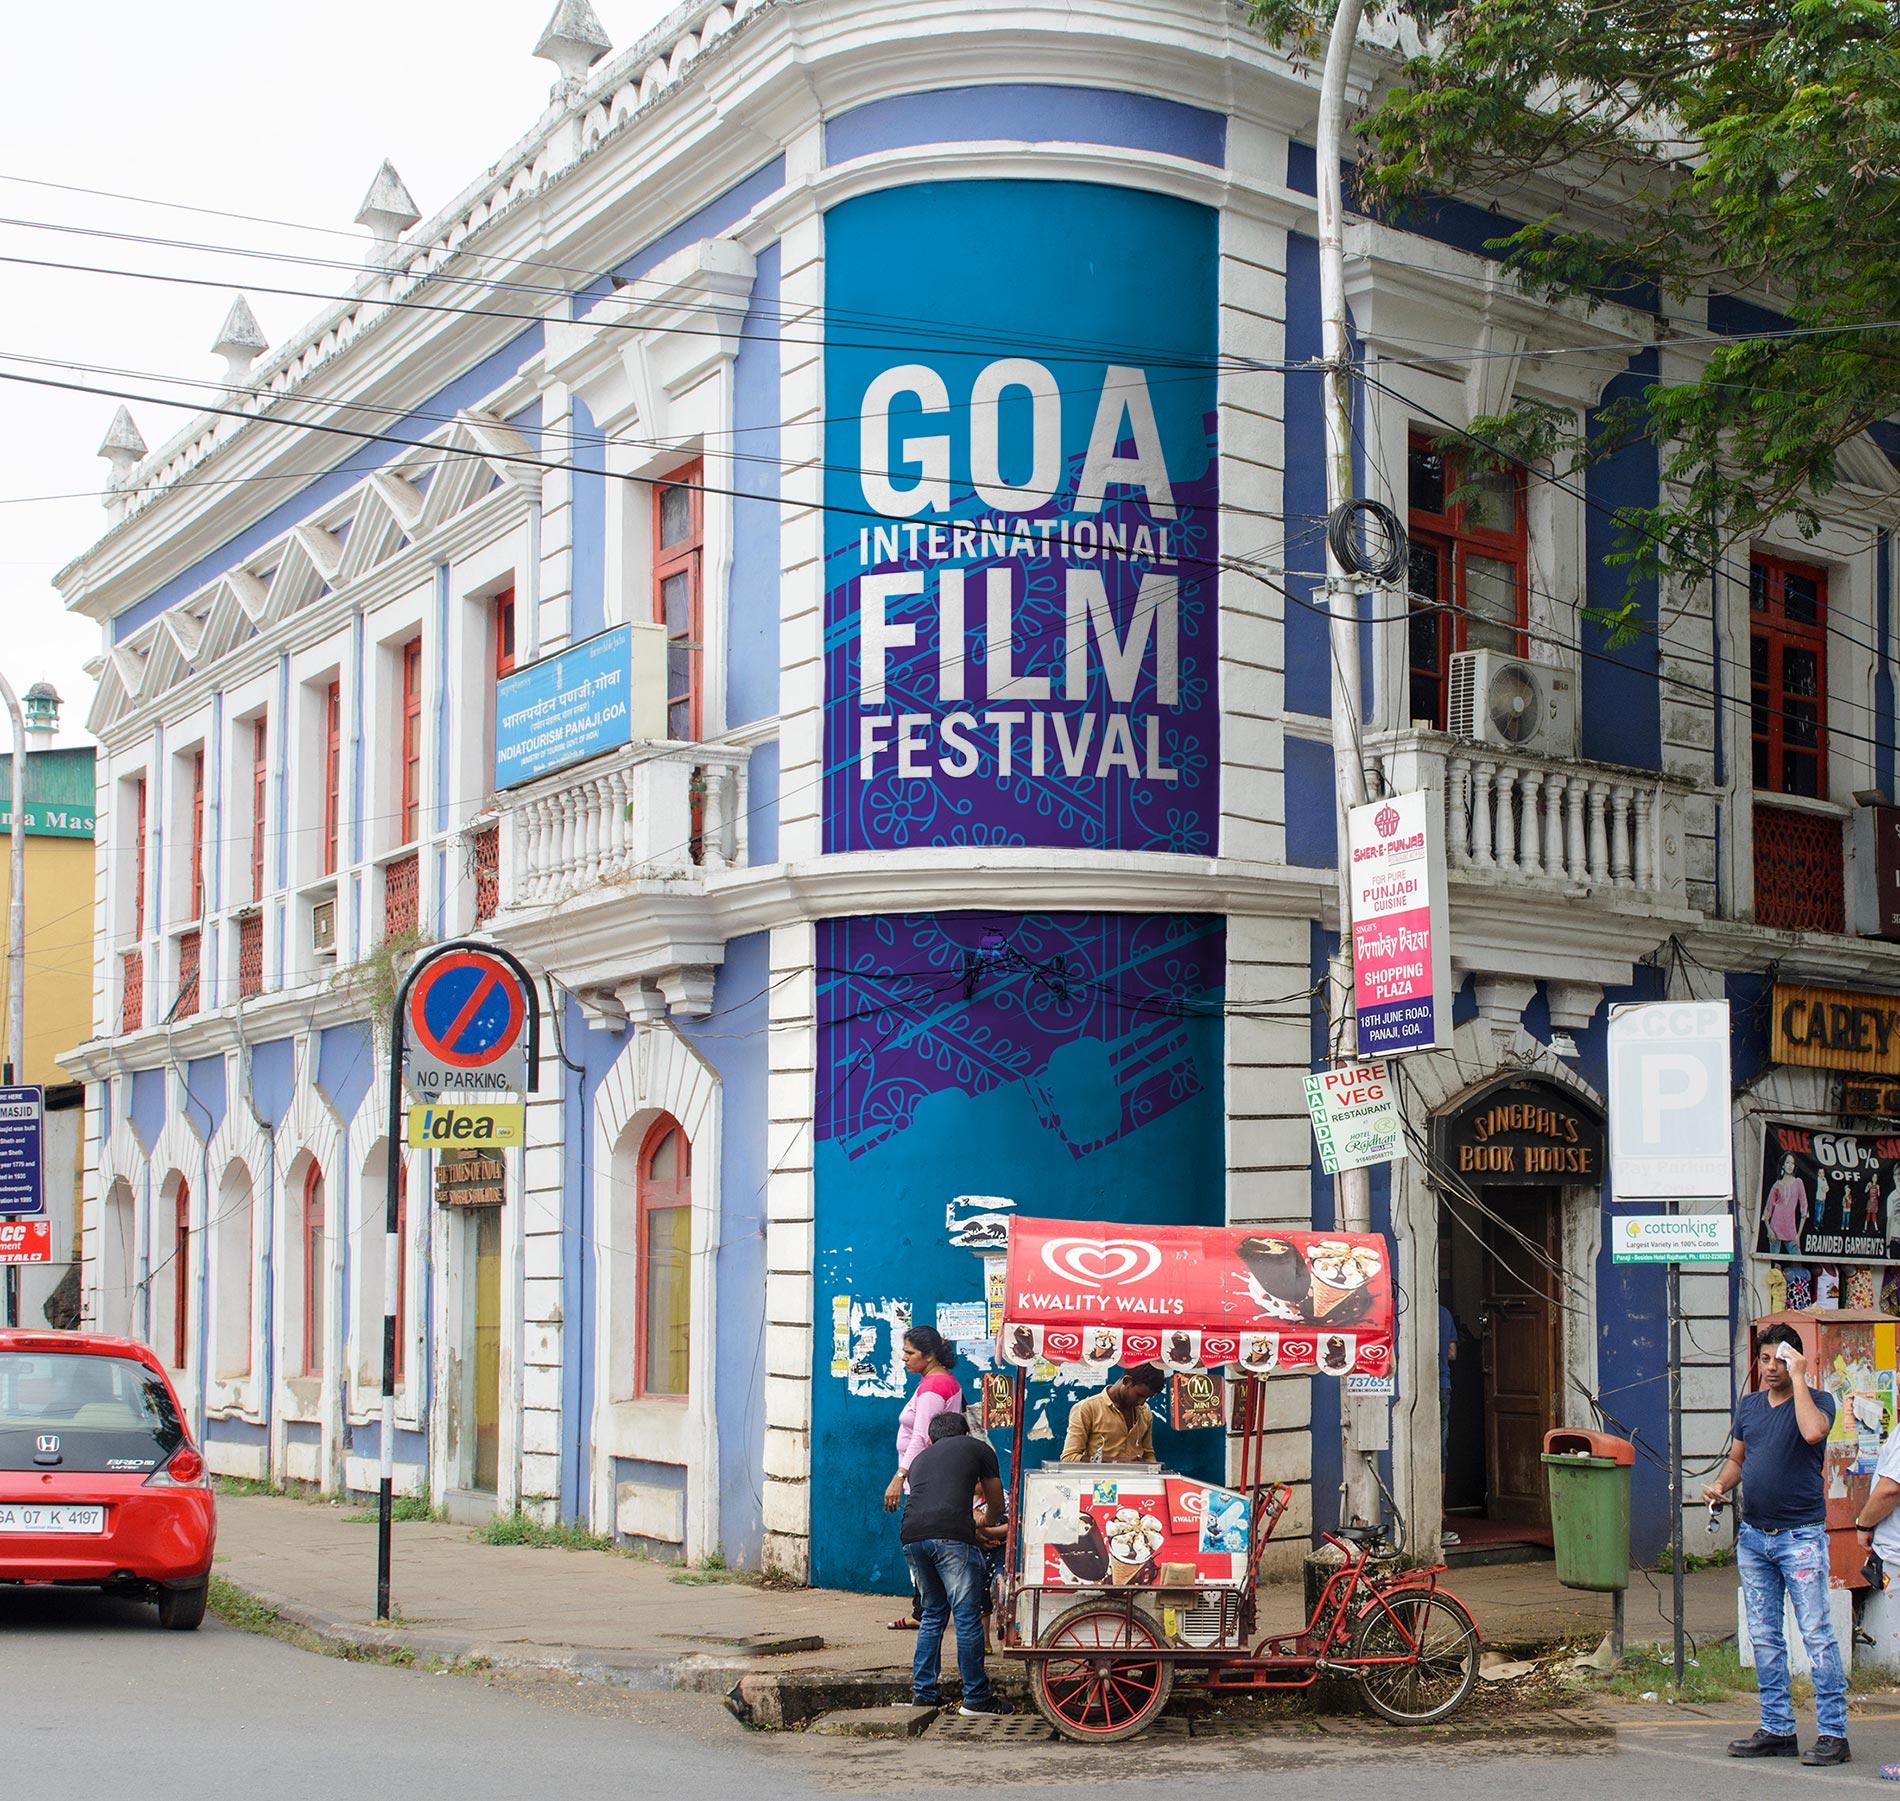 GOA-international-film-festival-sputnik-design-partners-toronto-3.jpg